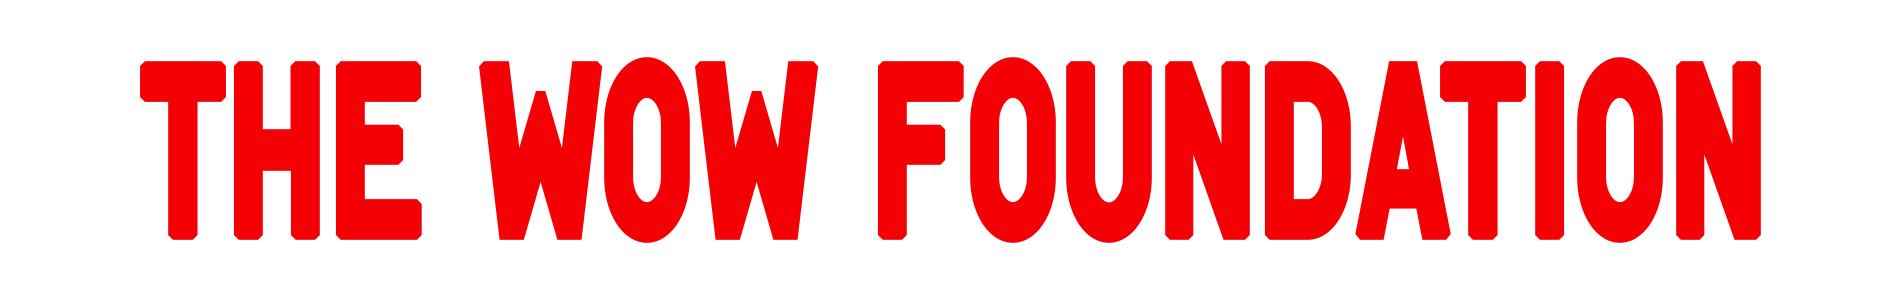 WOWFoundation-logo_horizontalrd.jpg